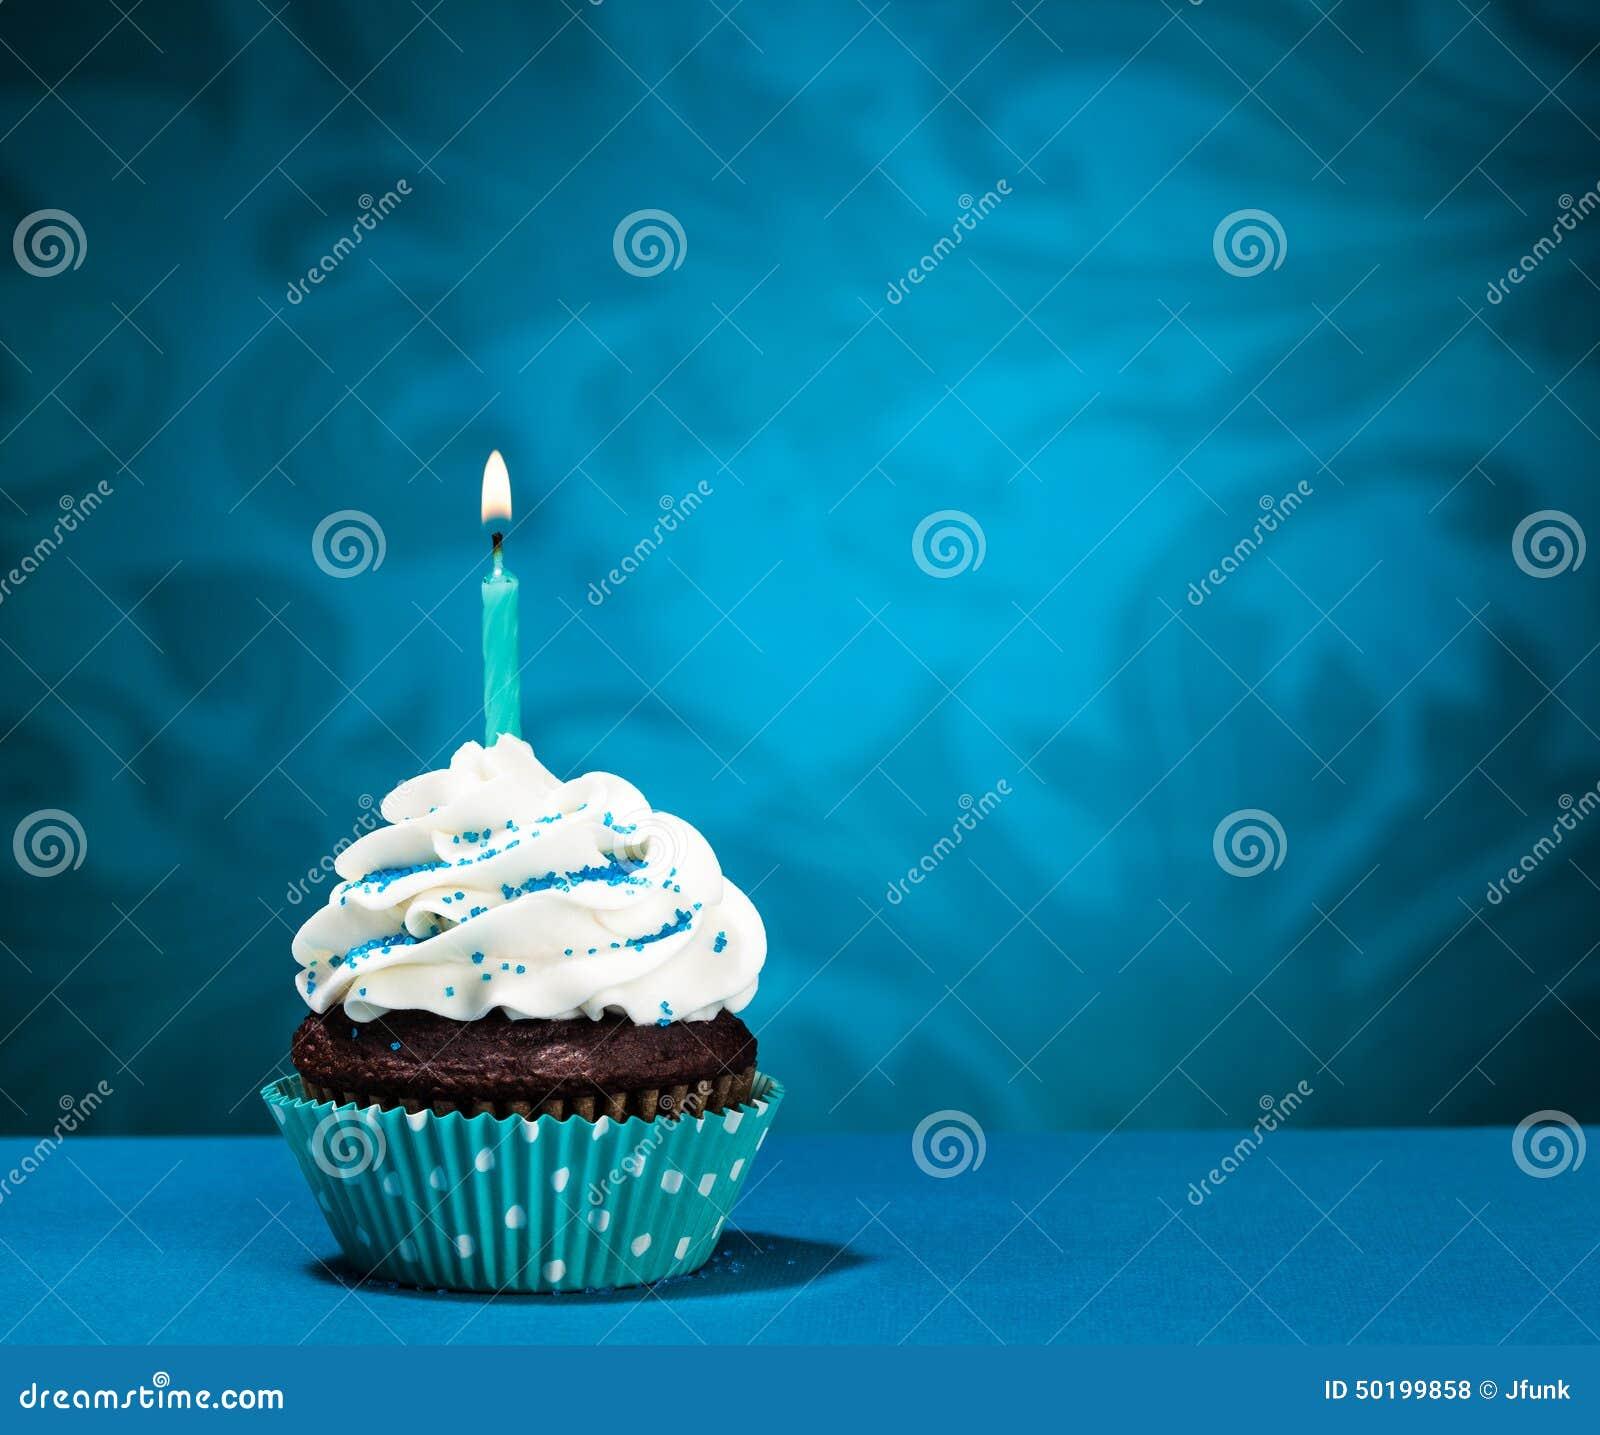 Birthday Cupcake stock photo Image of cupcake buttercream 50199858